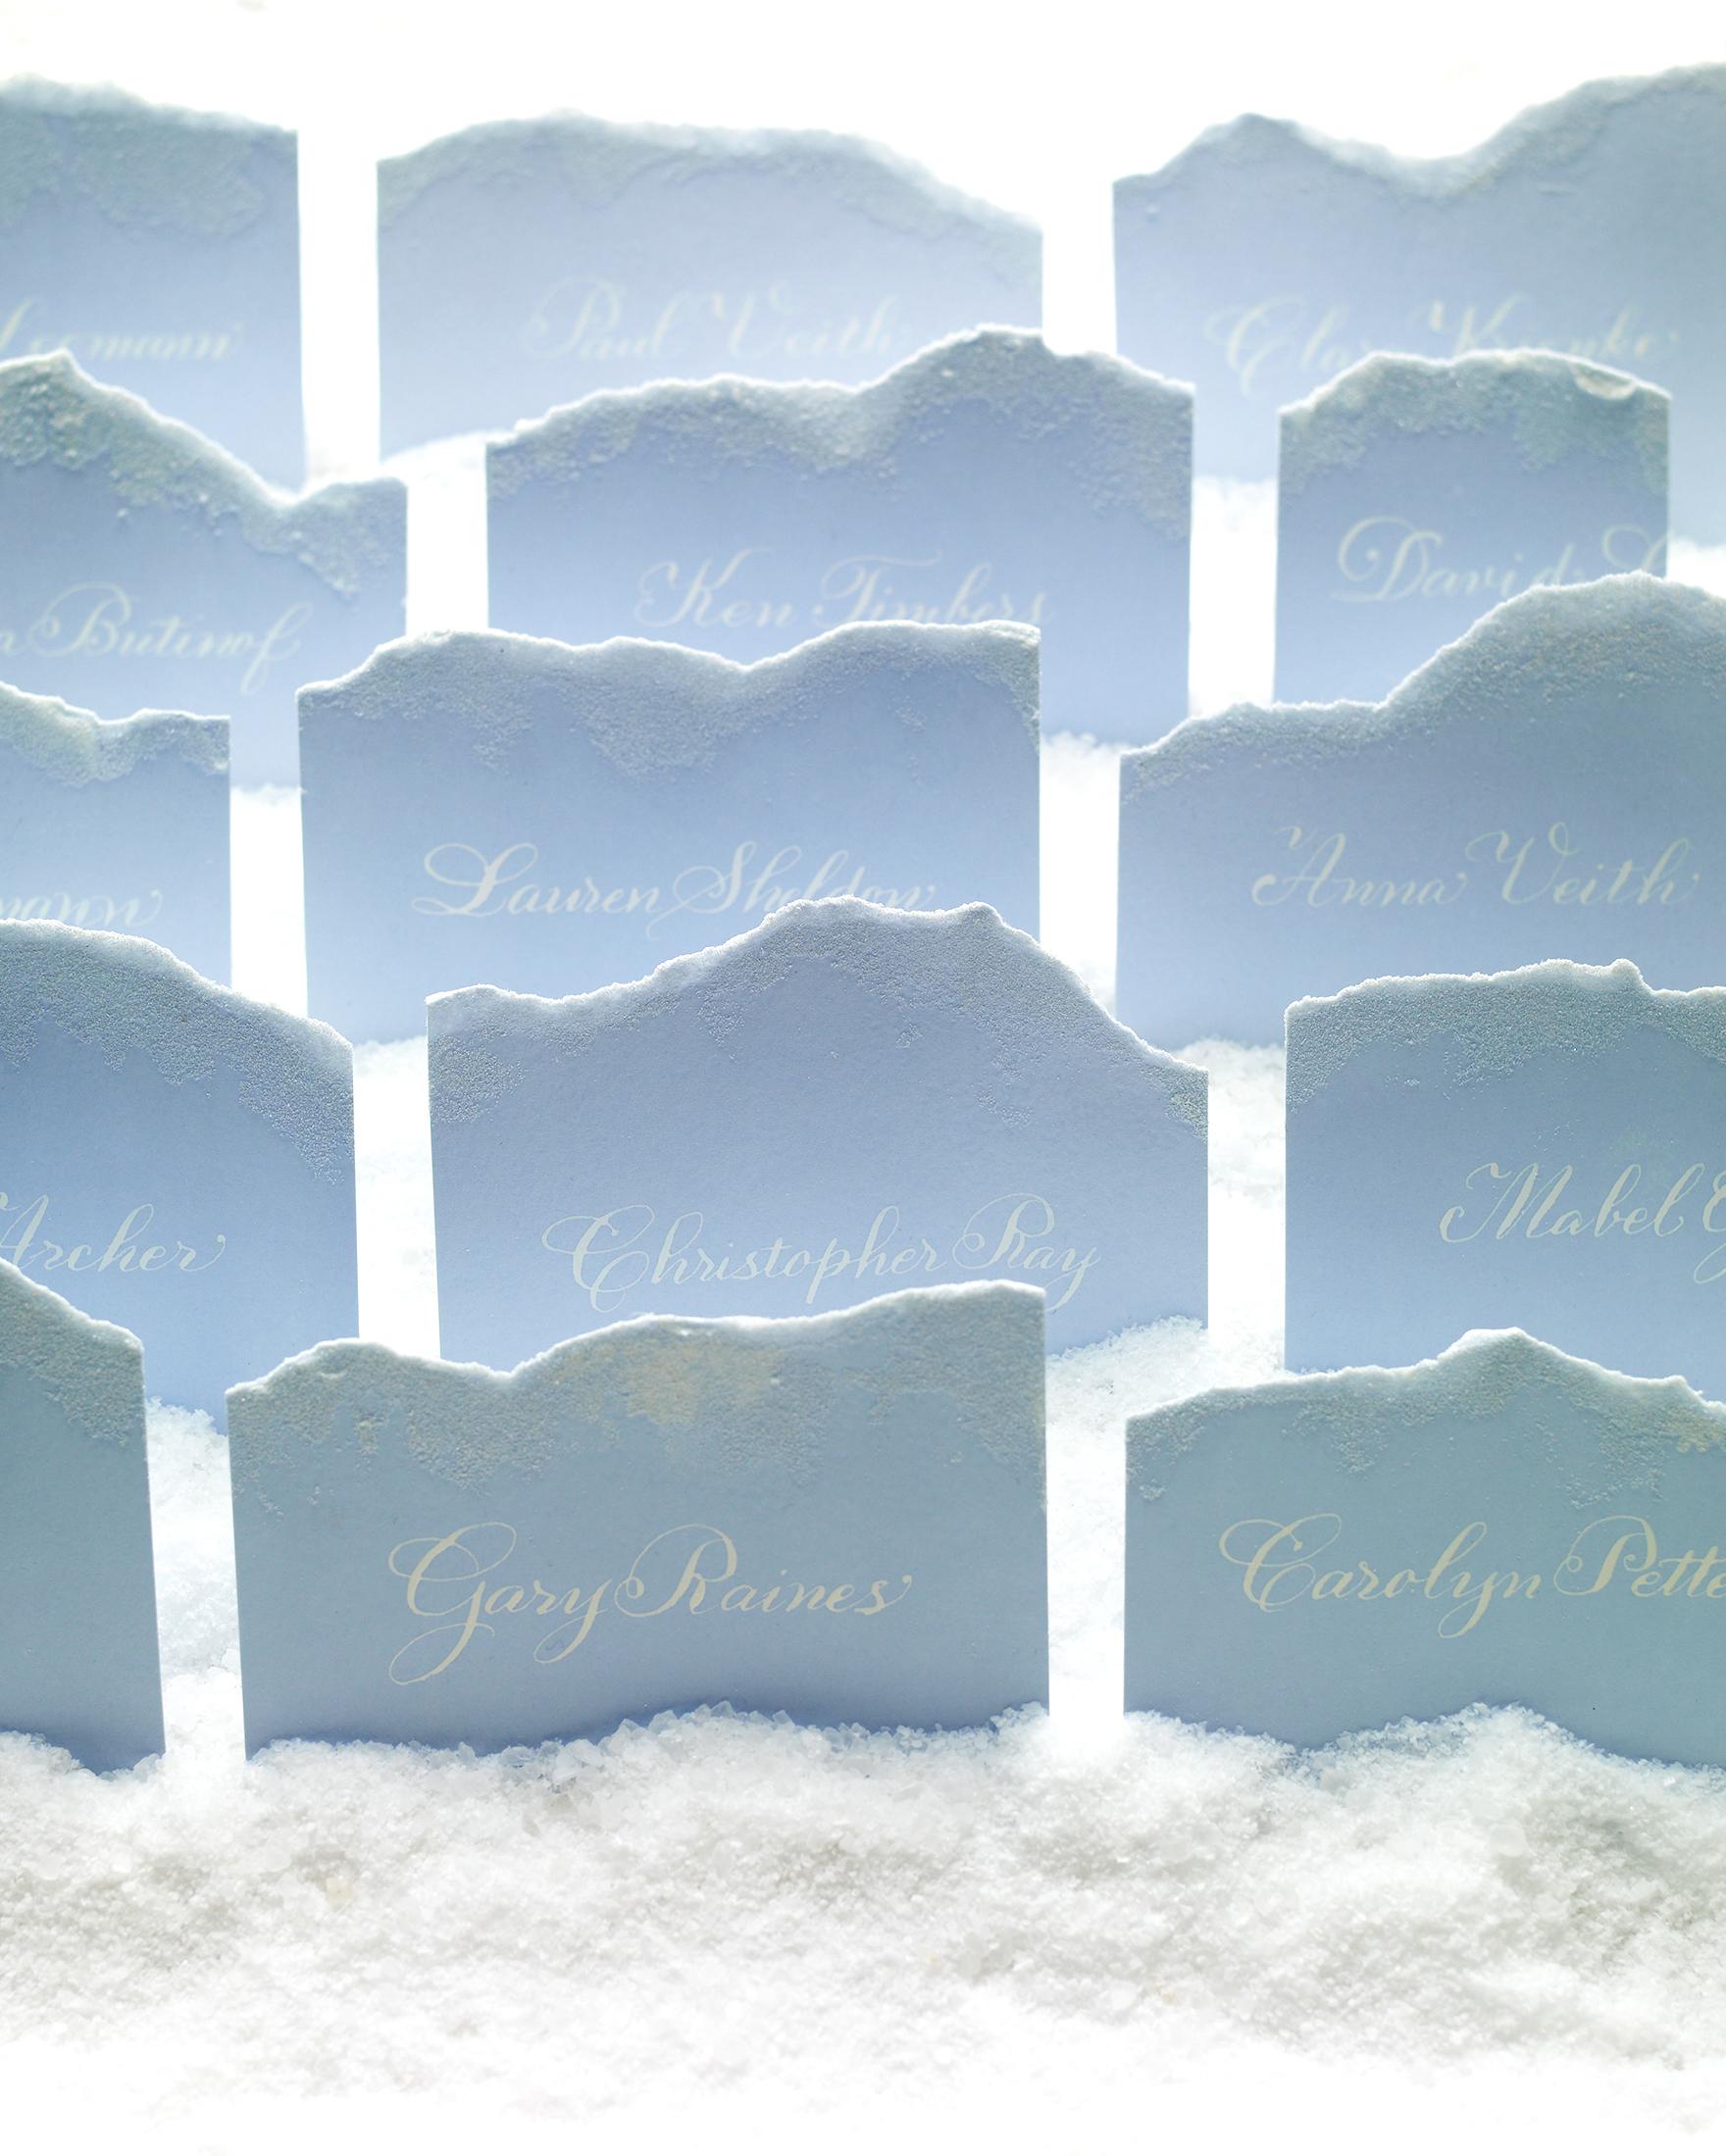 diy-winter-wedding-ideas-snow-escort-cards-1114.jpg